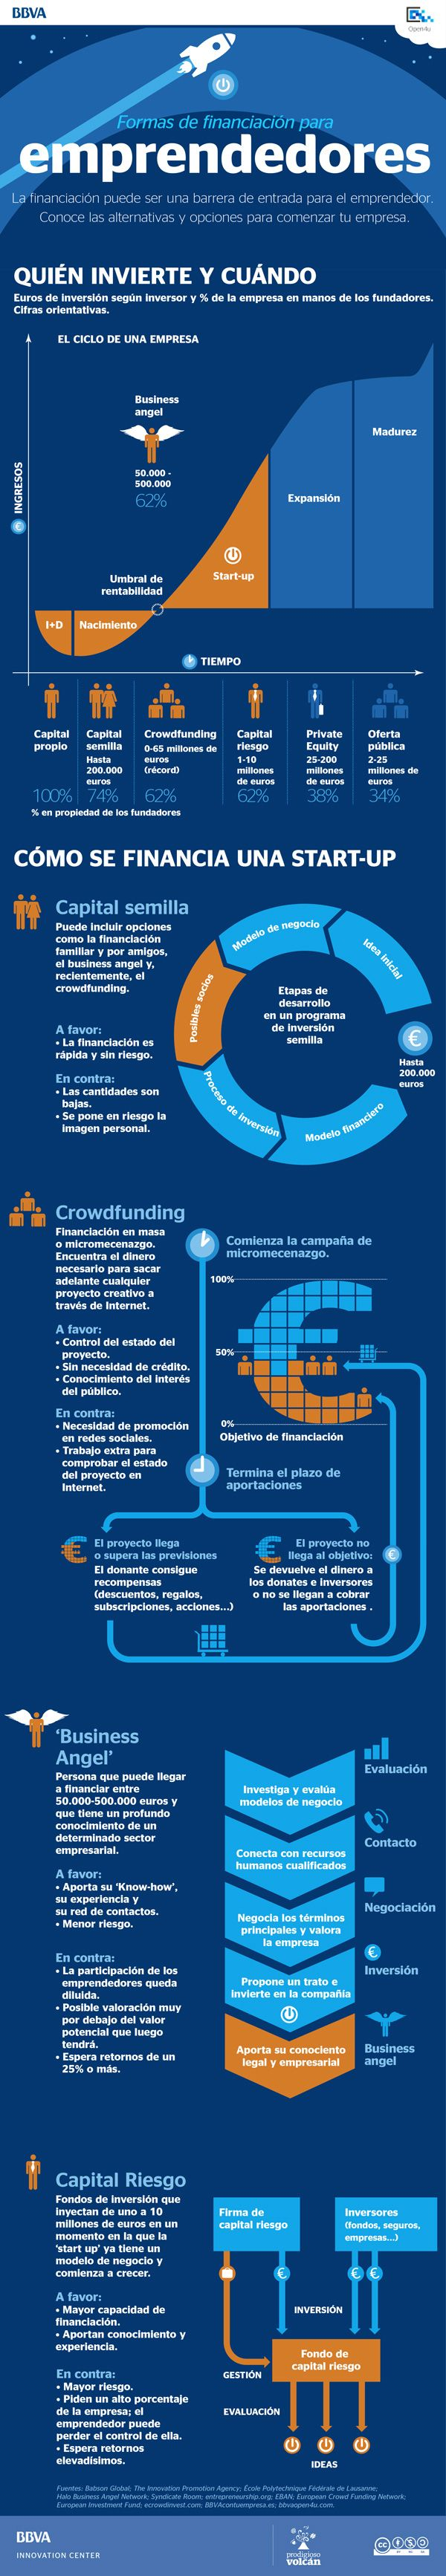 Fuentes de Financiación para Iniciar tu Startup o emprendimeinto